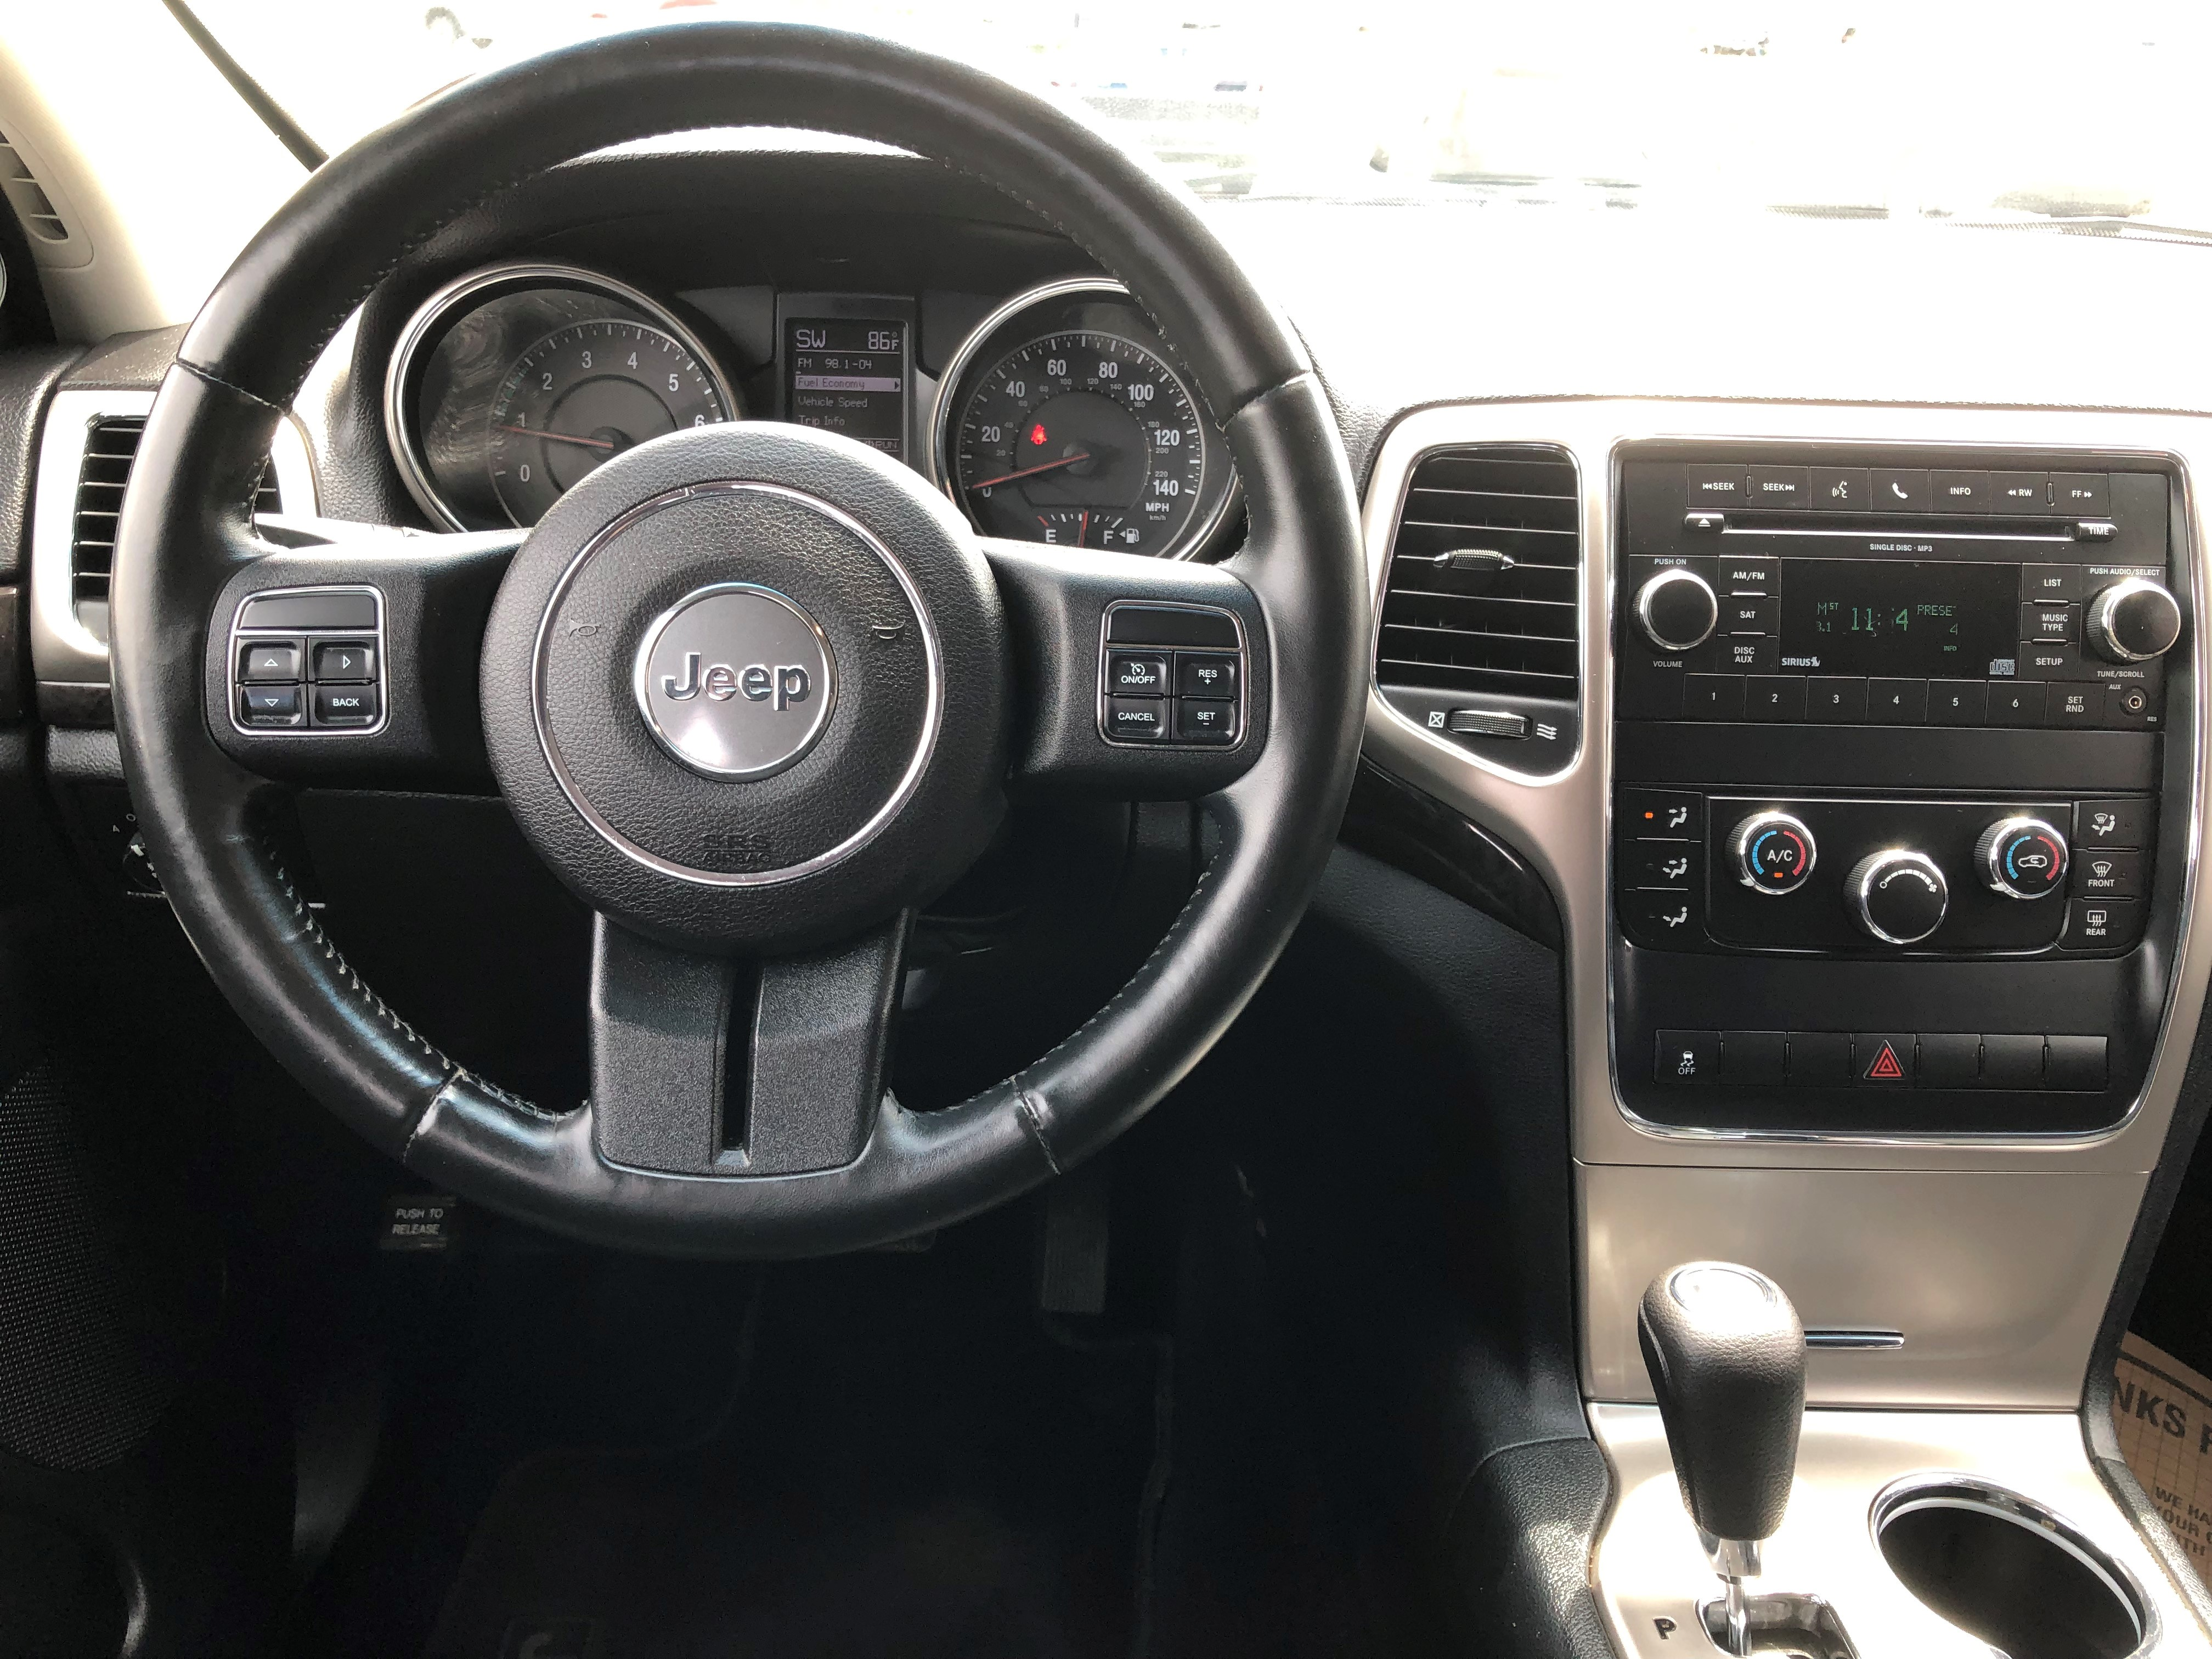 used vehicle - SUV JEEP GRAND CHEROKEE 2011